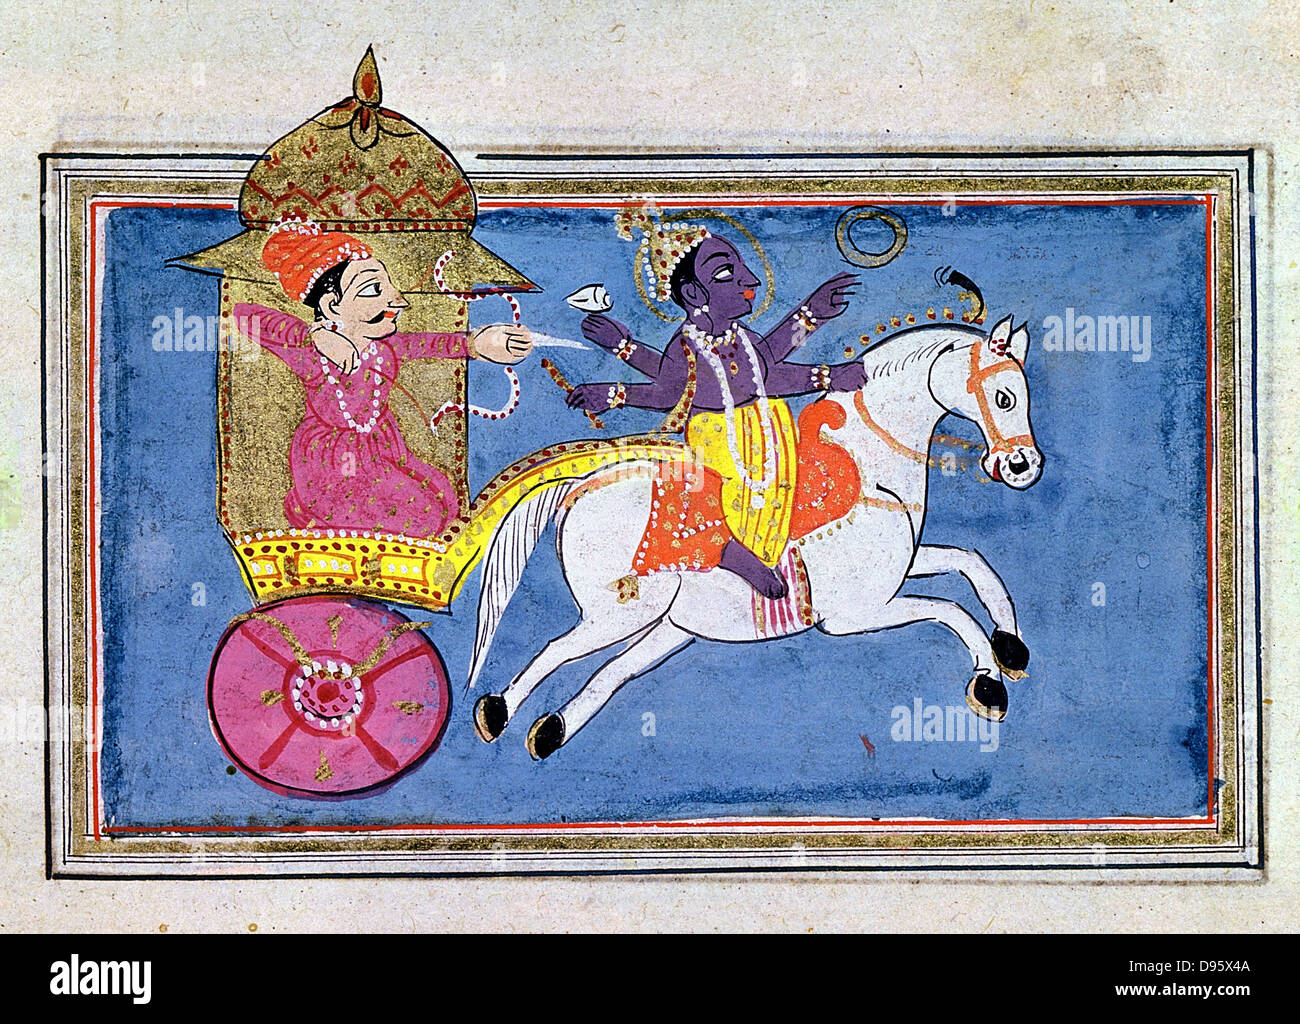 Krishna, Hindu deity, an avatar of Vishnu. 17th century illustration for epic poem 'Mahabharata' showing - Stock Image